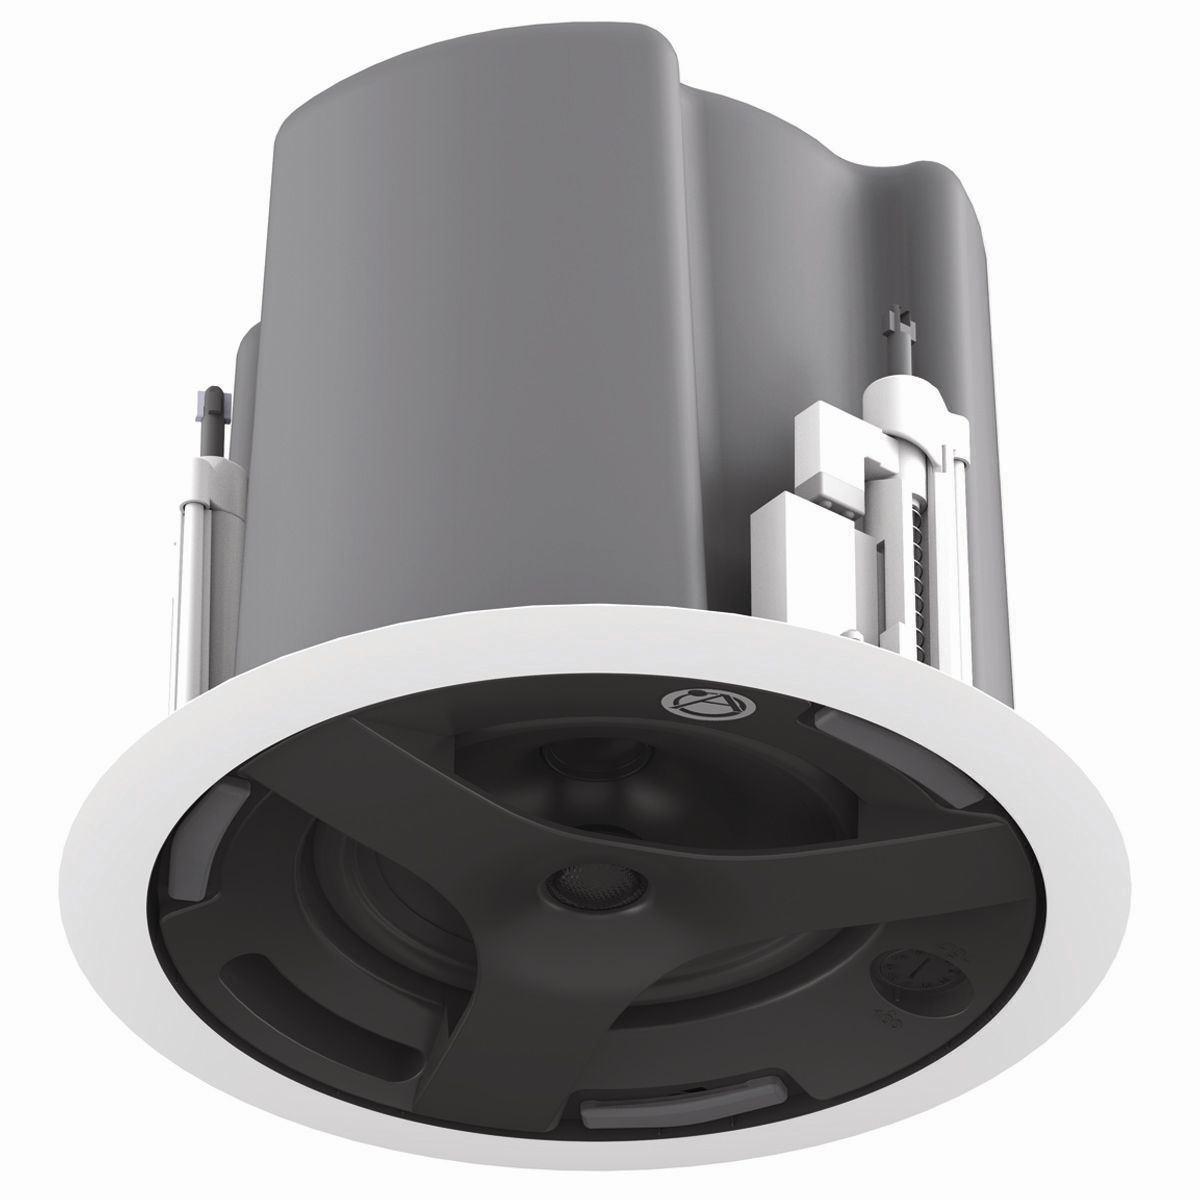 6 5 Quot Coaxial In Ceiling Loudspeaker With 32 Watt 70v 100v